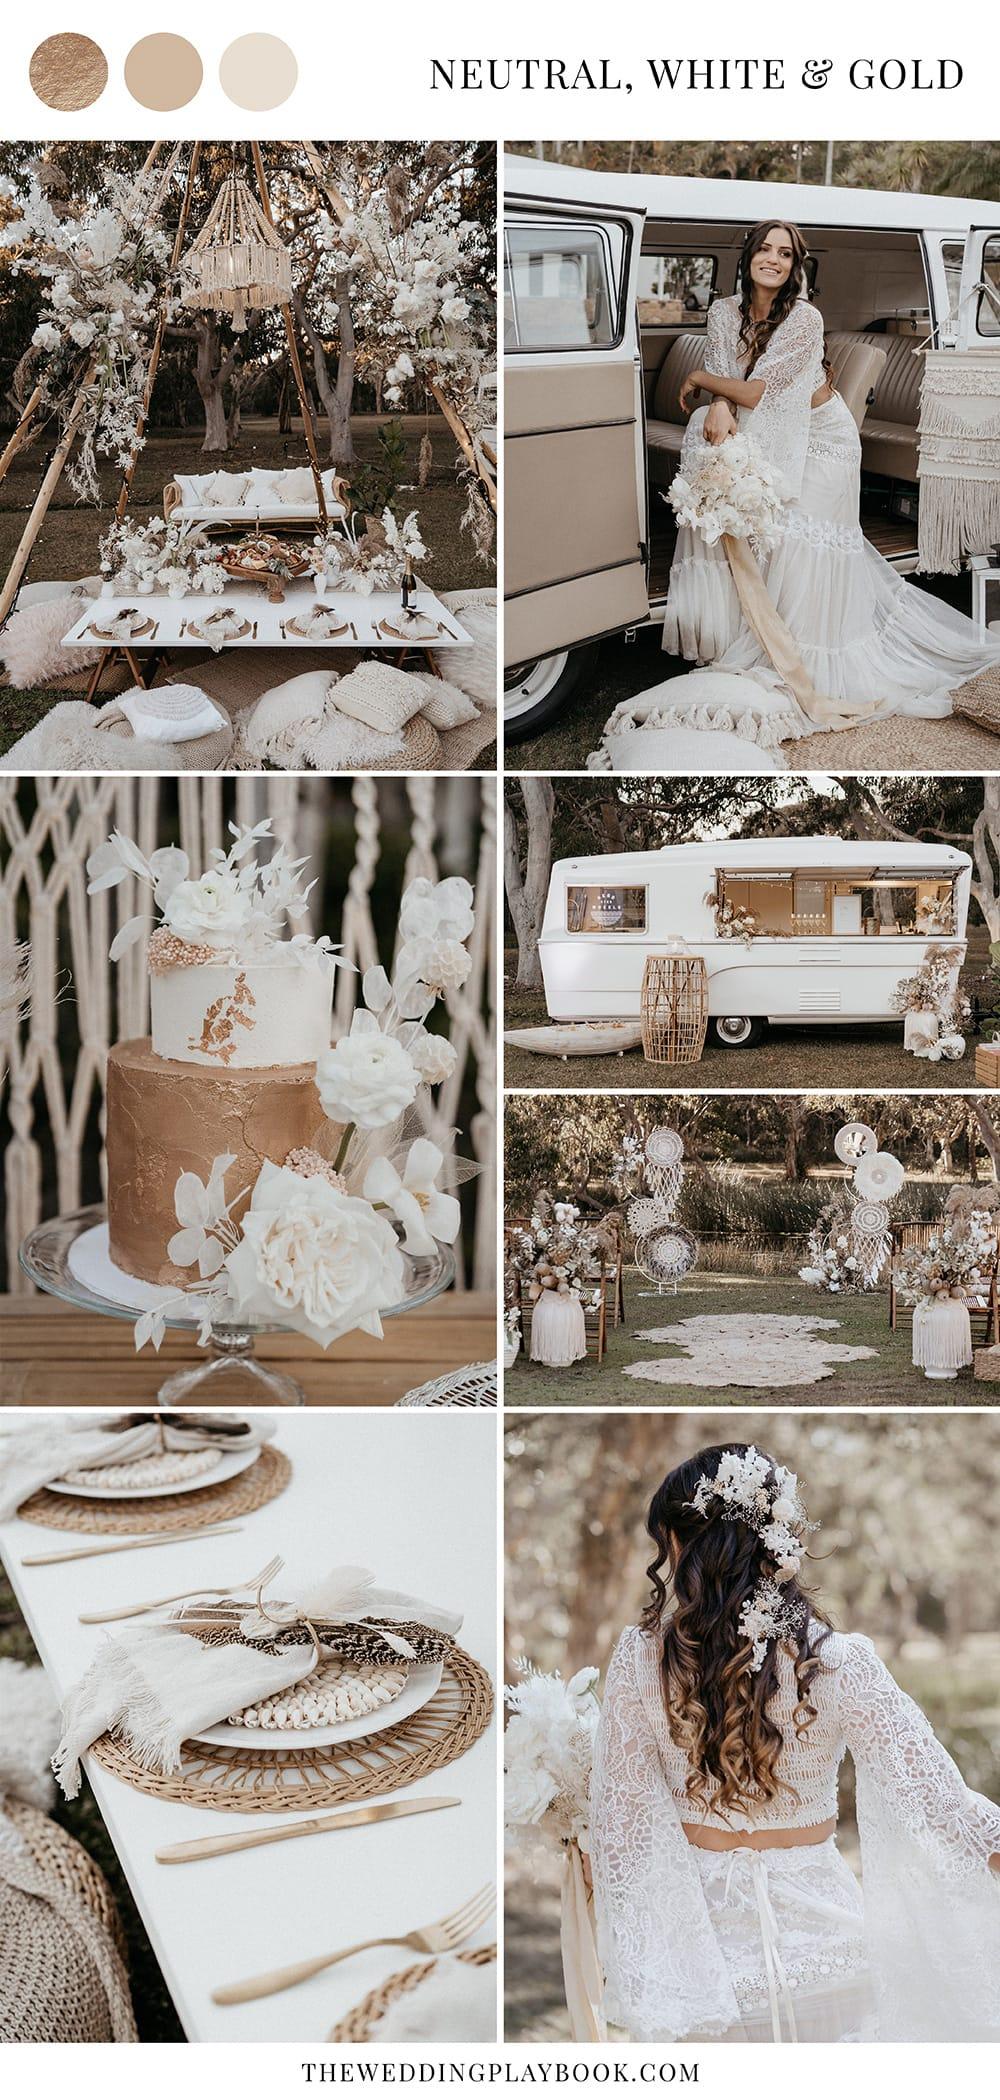 Outdoor Festival Bohemian Wedding Inspiration in Neutral, White & Gold   Photography: Shae Estella Photo